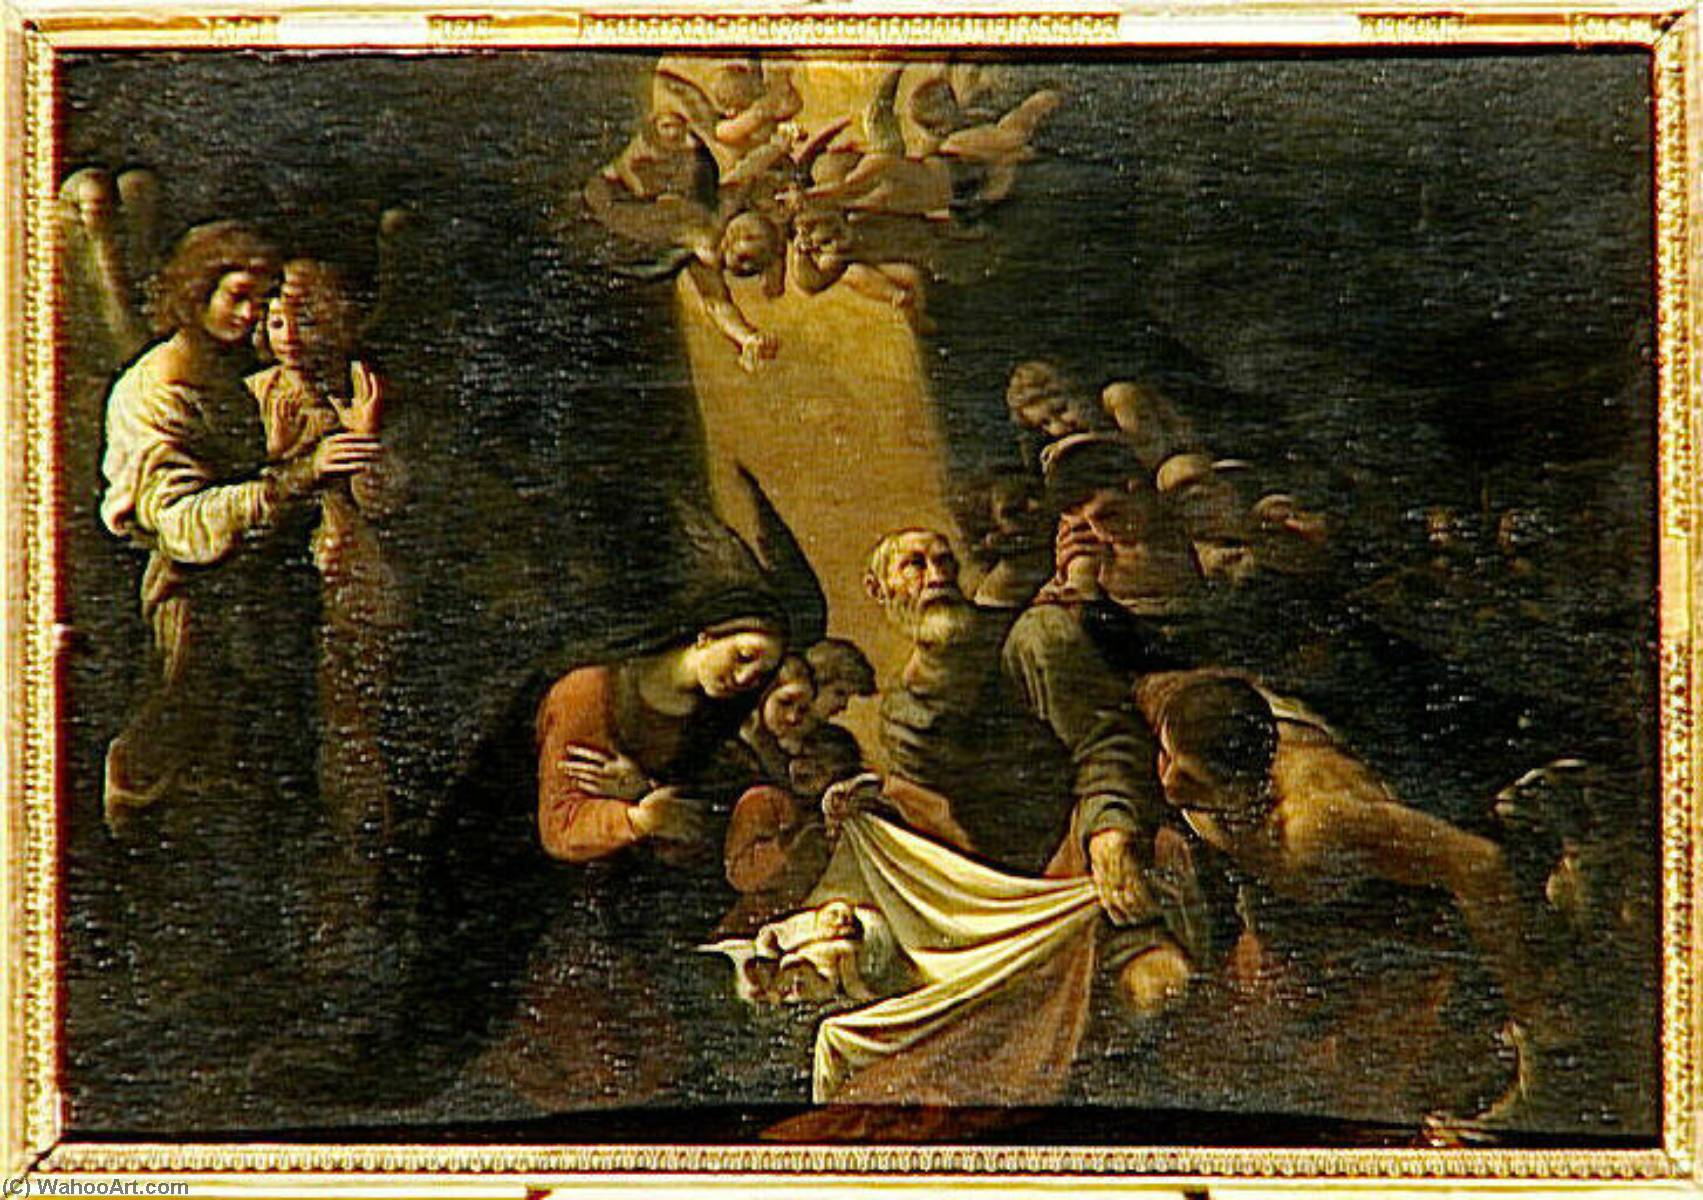 Ludovico-Carracci-L-Adoration-des-bergers-La-Nativite-de-Jesus-Christ.jpg